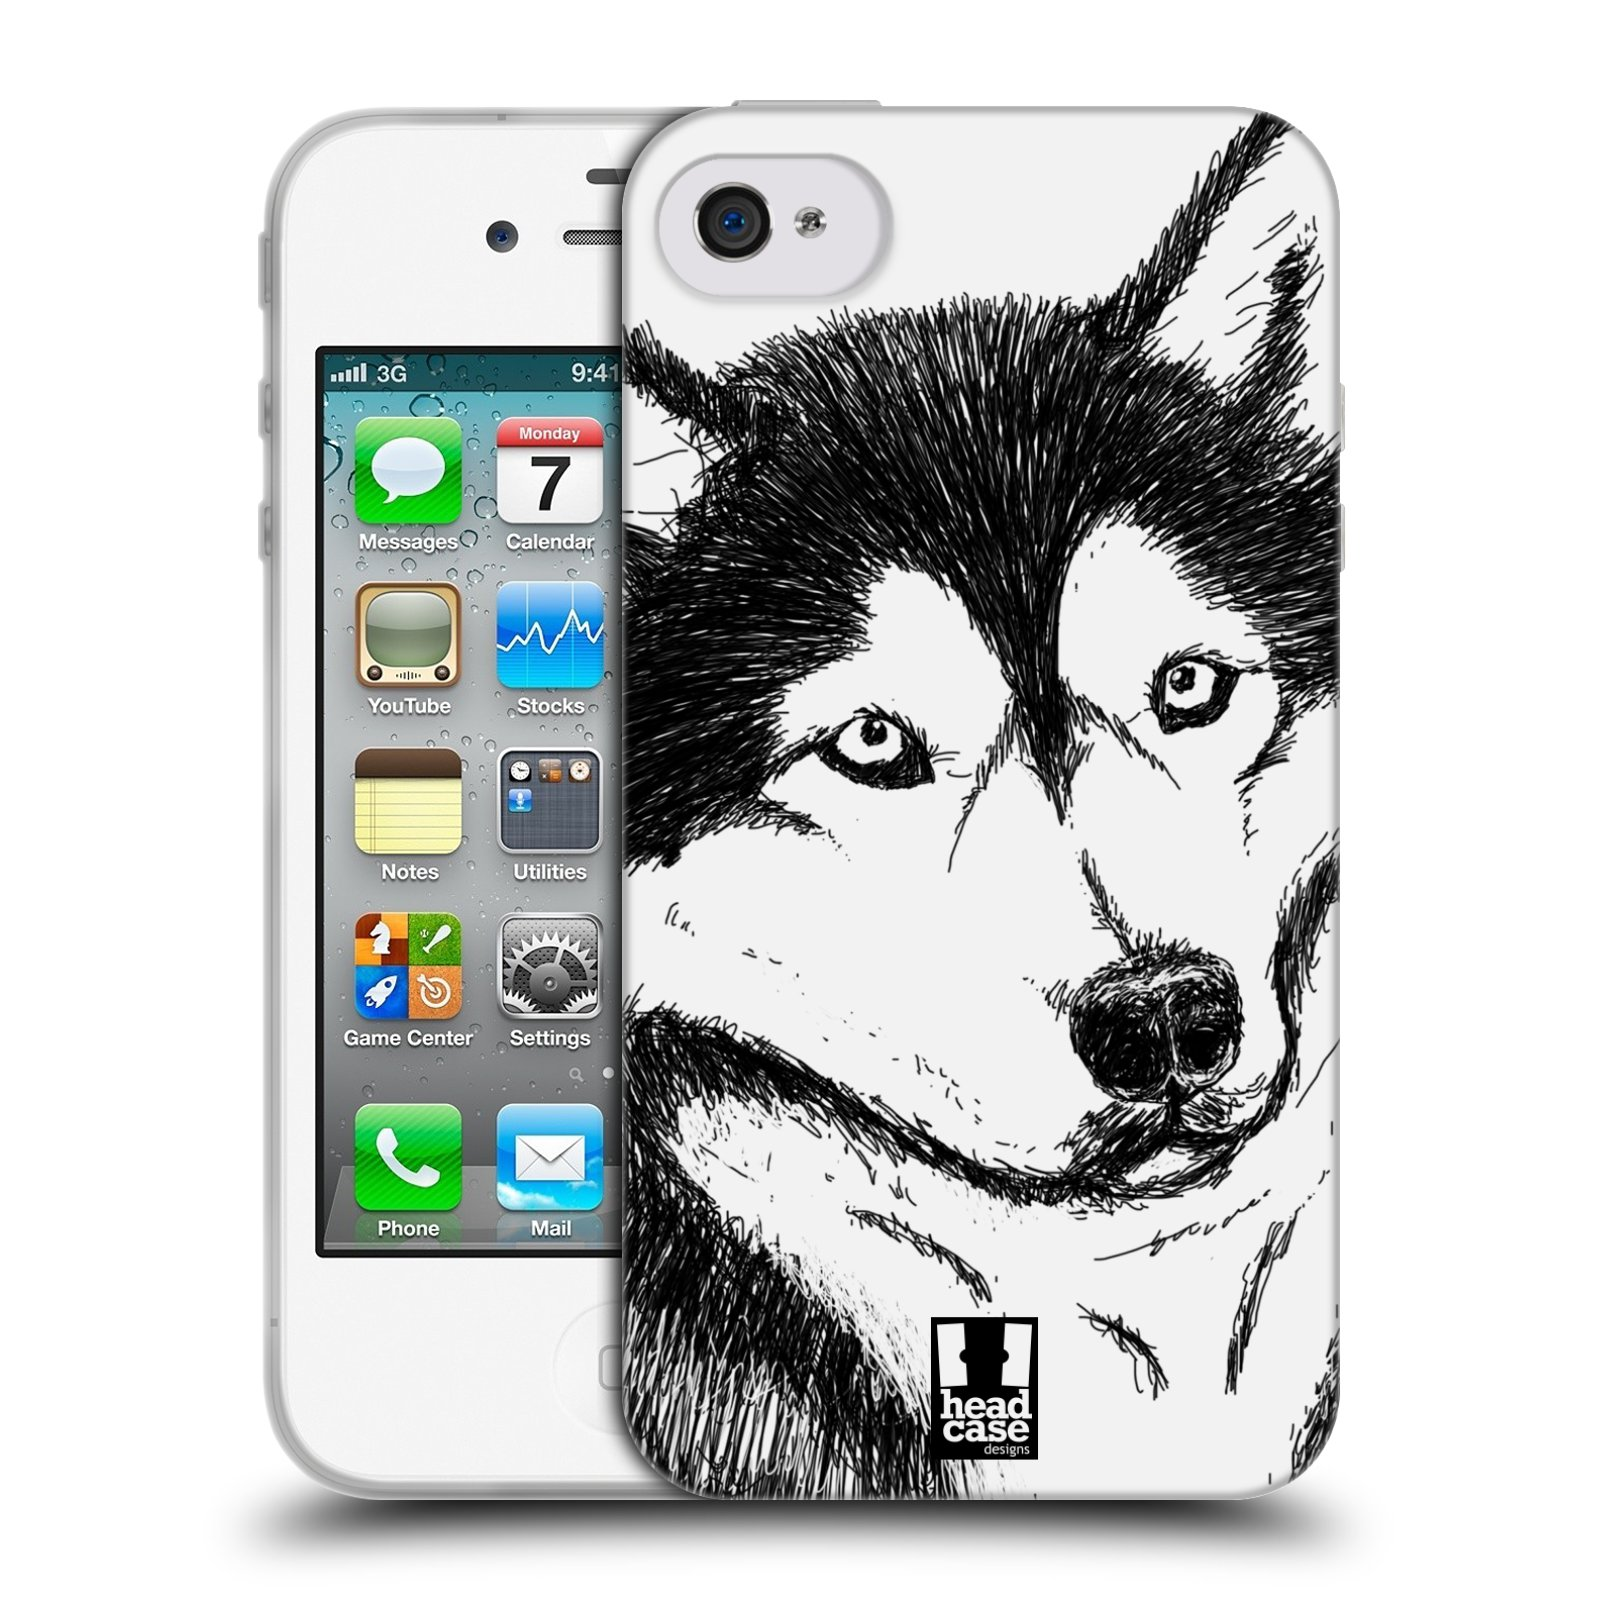 HEAD CASE silikonový obal na mobil Apple Iphone 4/4S vzor Kreslená zvířátka černá a bílá pes husky